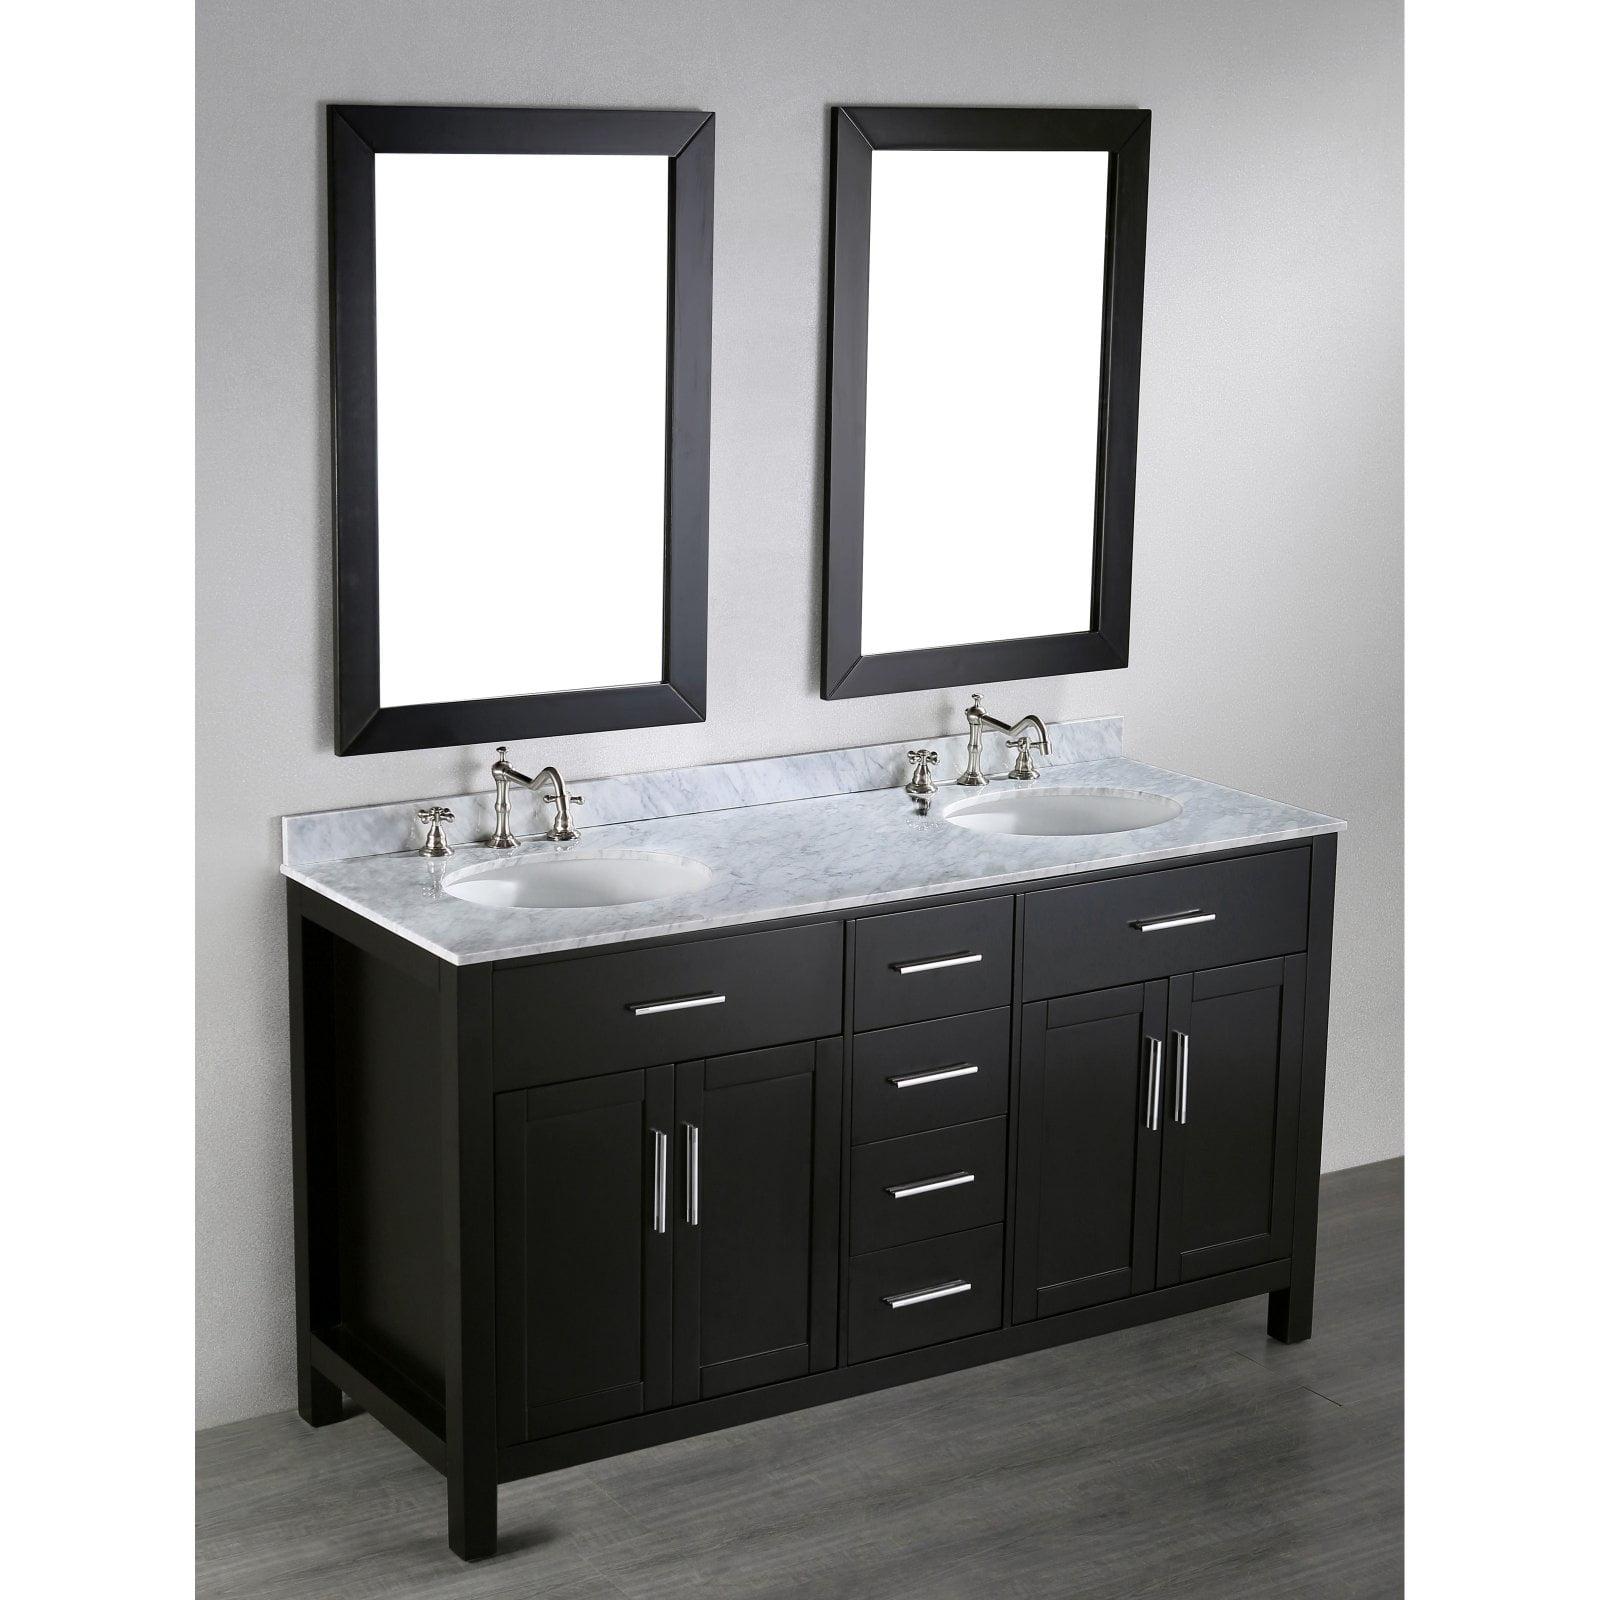 60'' Bosconi SB-252-4 Contemporary Double Vanity